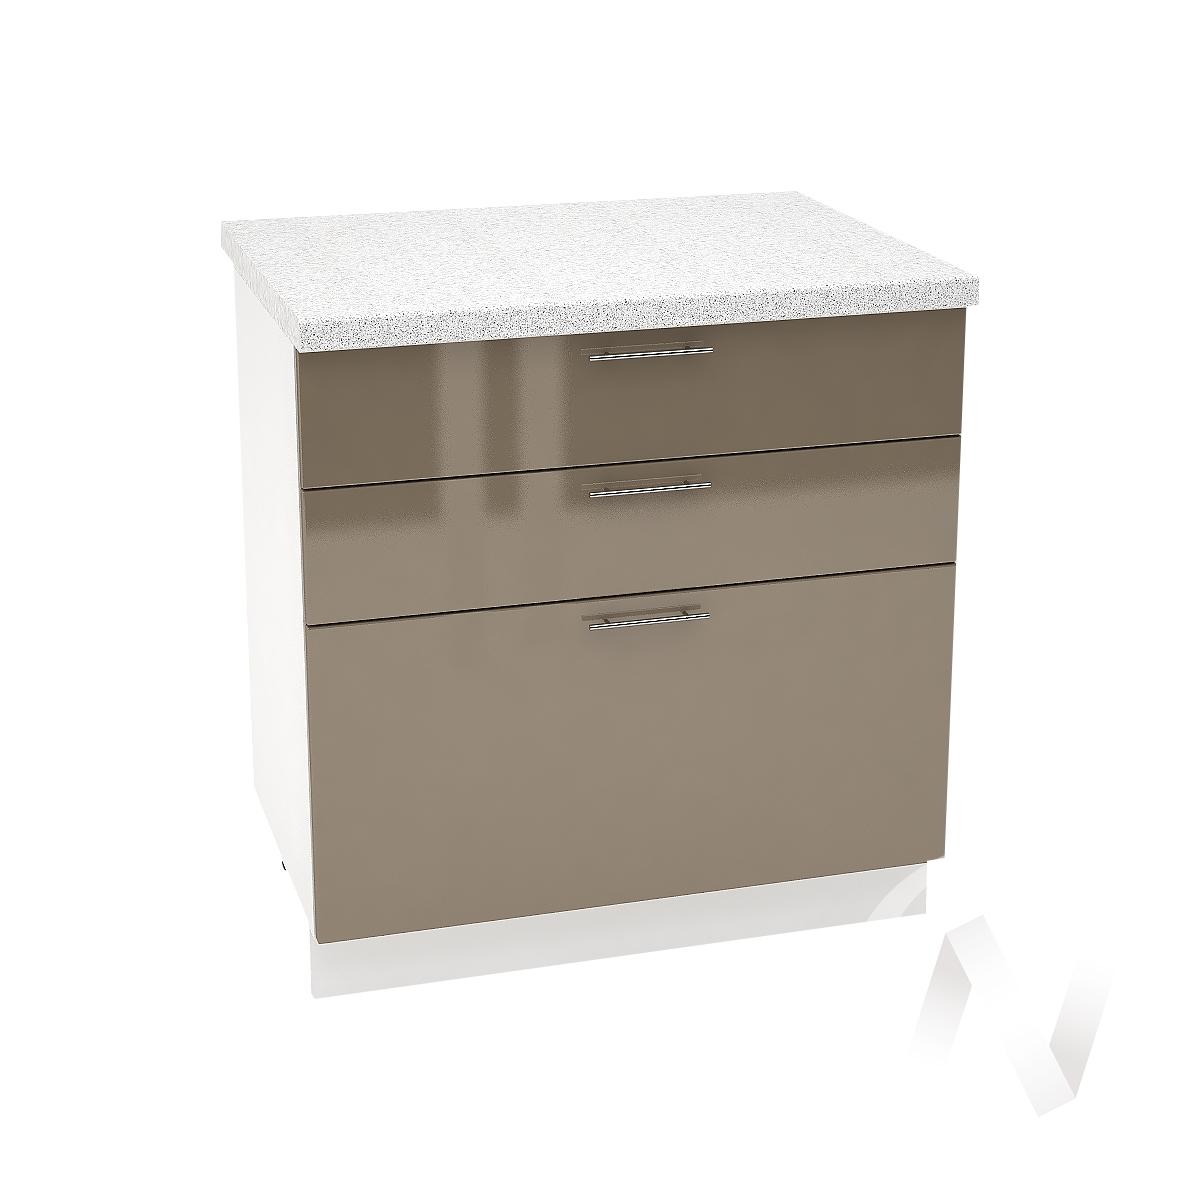 "Кухня ""Валерия-М"": Шкаф нижний с 3-мя ящиками 800, ШН3Я 800 (Капучино глянец/корпус белый)"